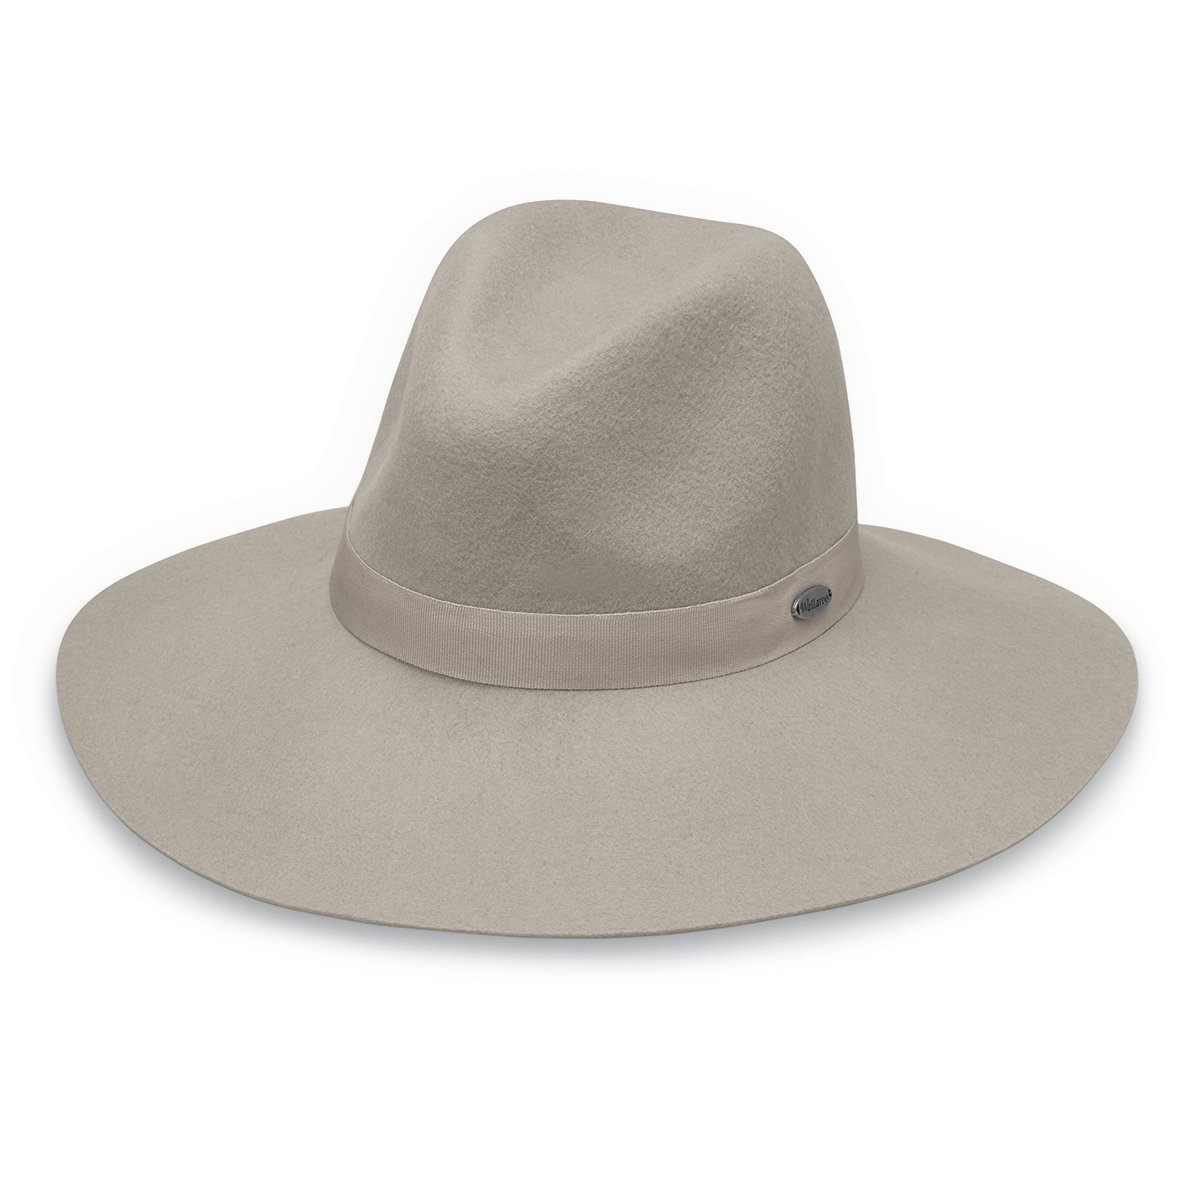 74d8410db4e Wallaroo Women s Catriona Felt Hat - UPF 50+ - Adjustable Fit (Black) at  Amazon Women s Clothing store